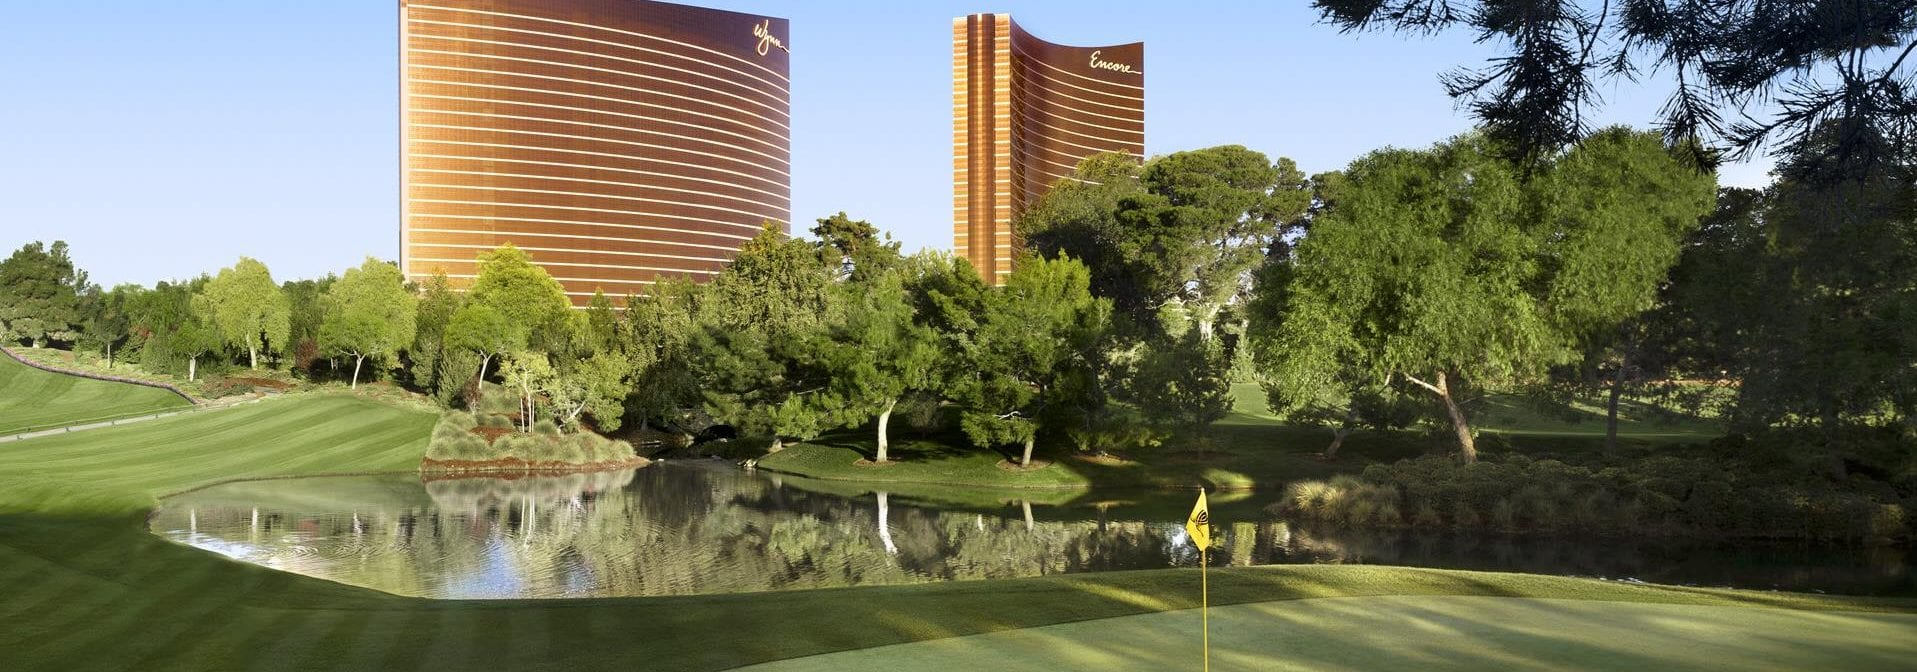 The Wynn and Encore Las Vegas buildings